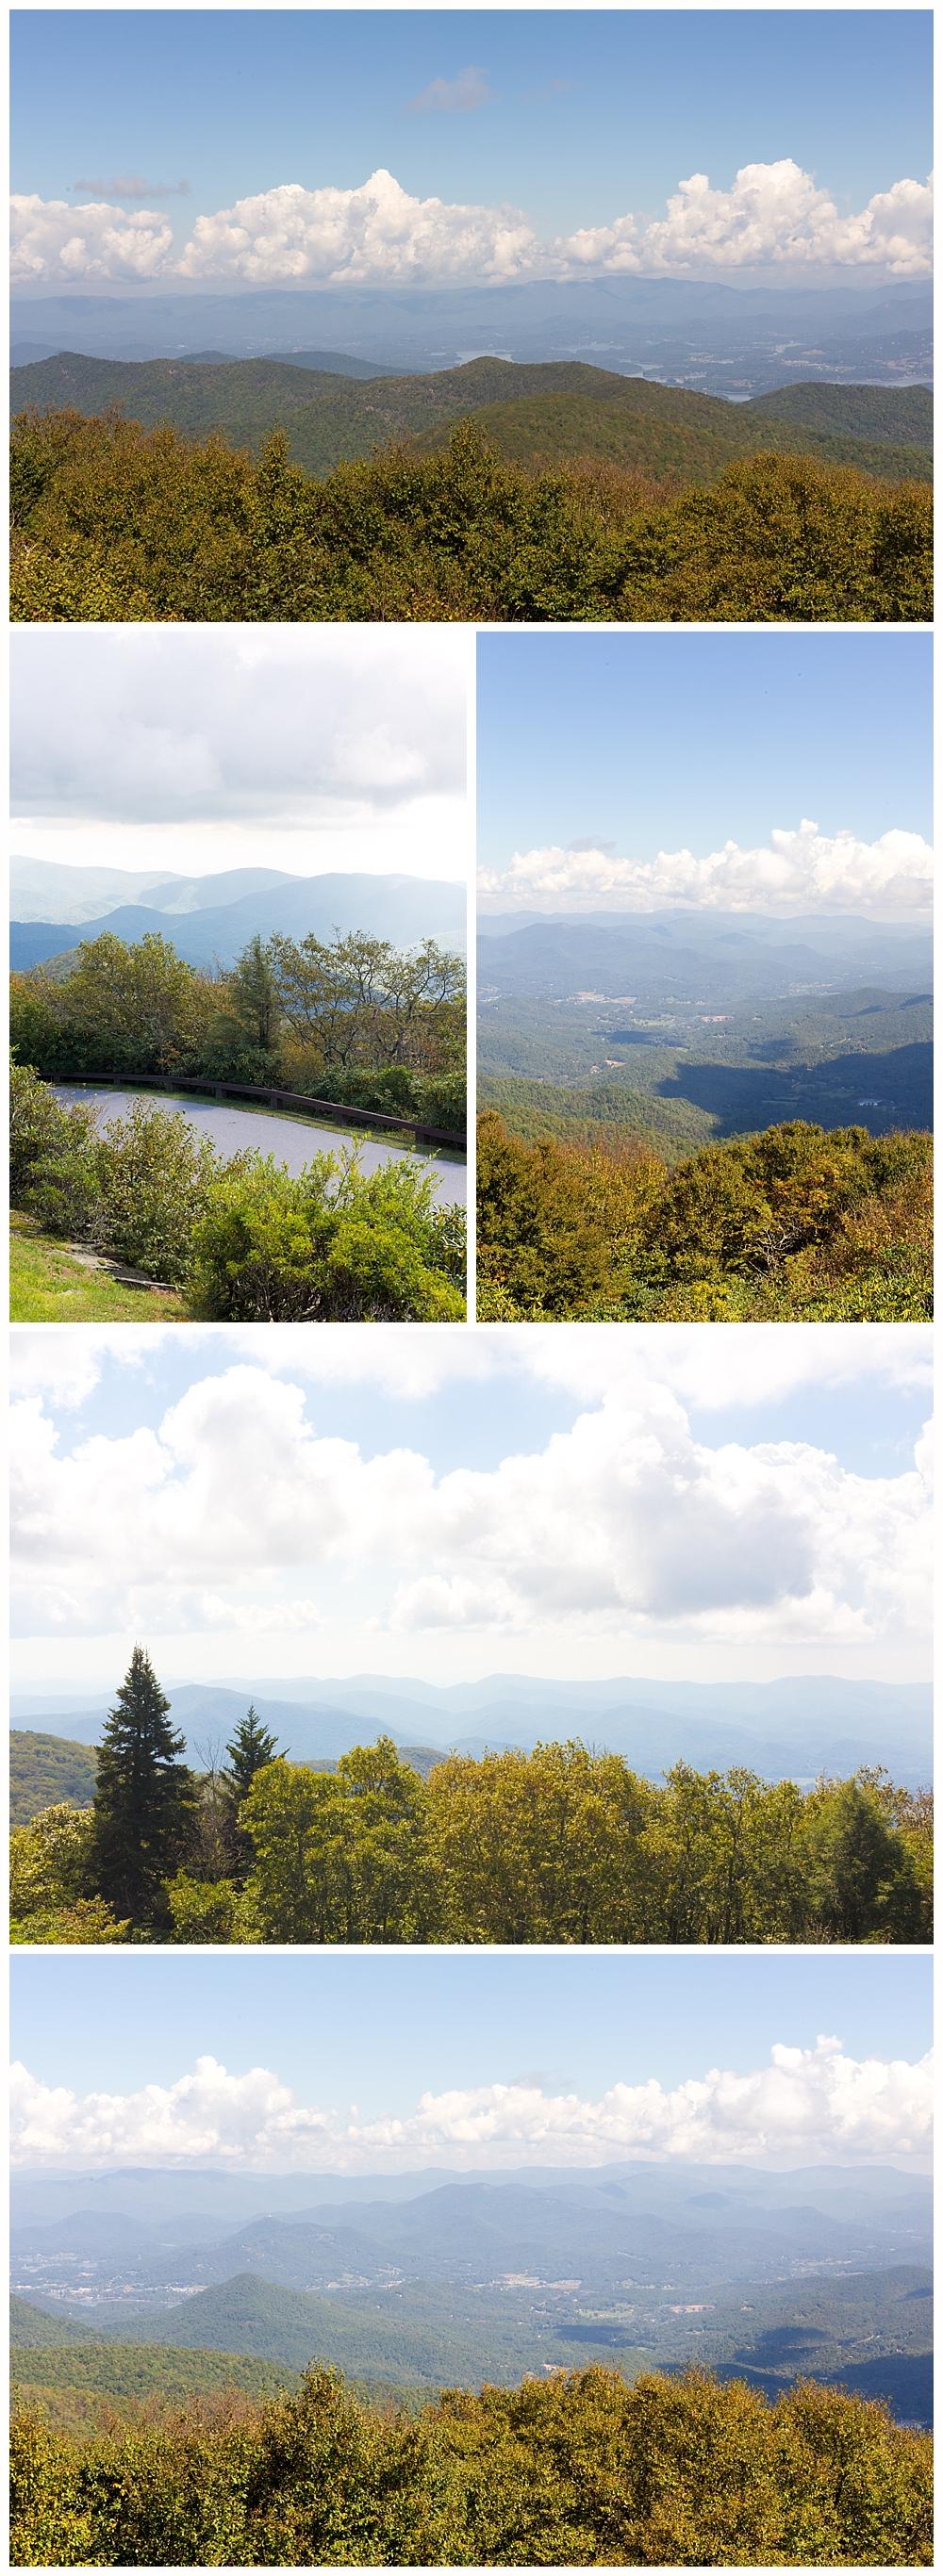 beautiful mountain scenery in Georgia - views from Brasstown Bald